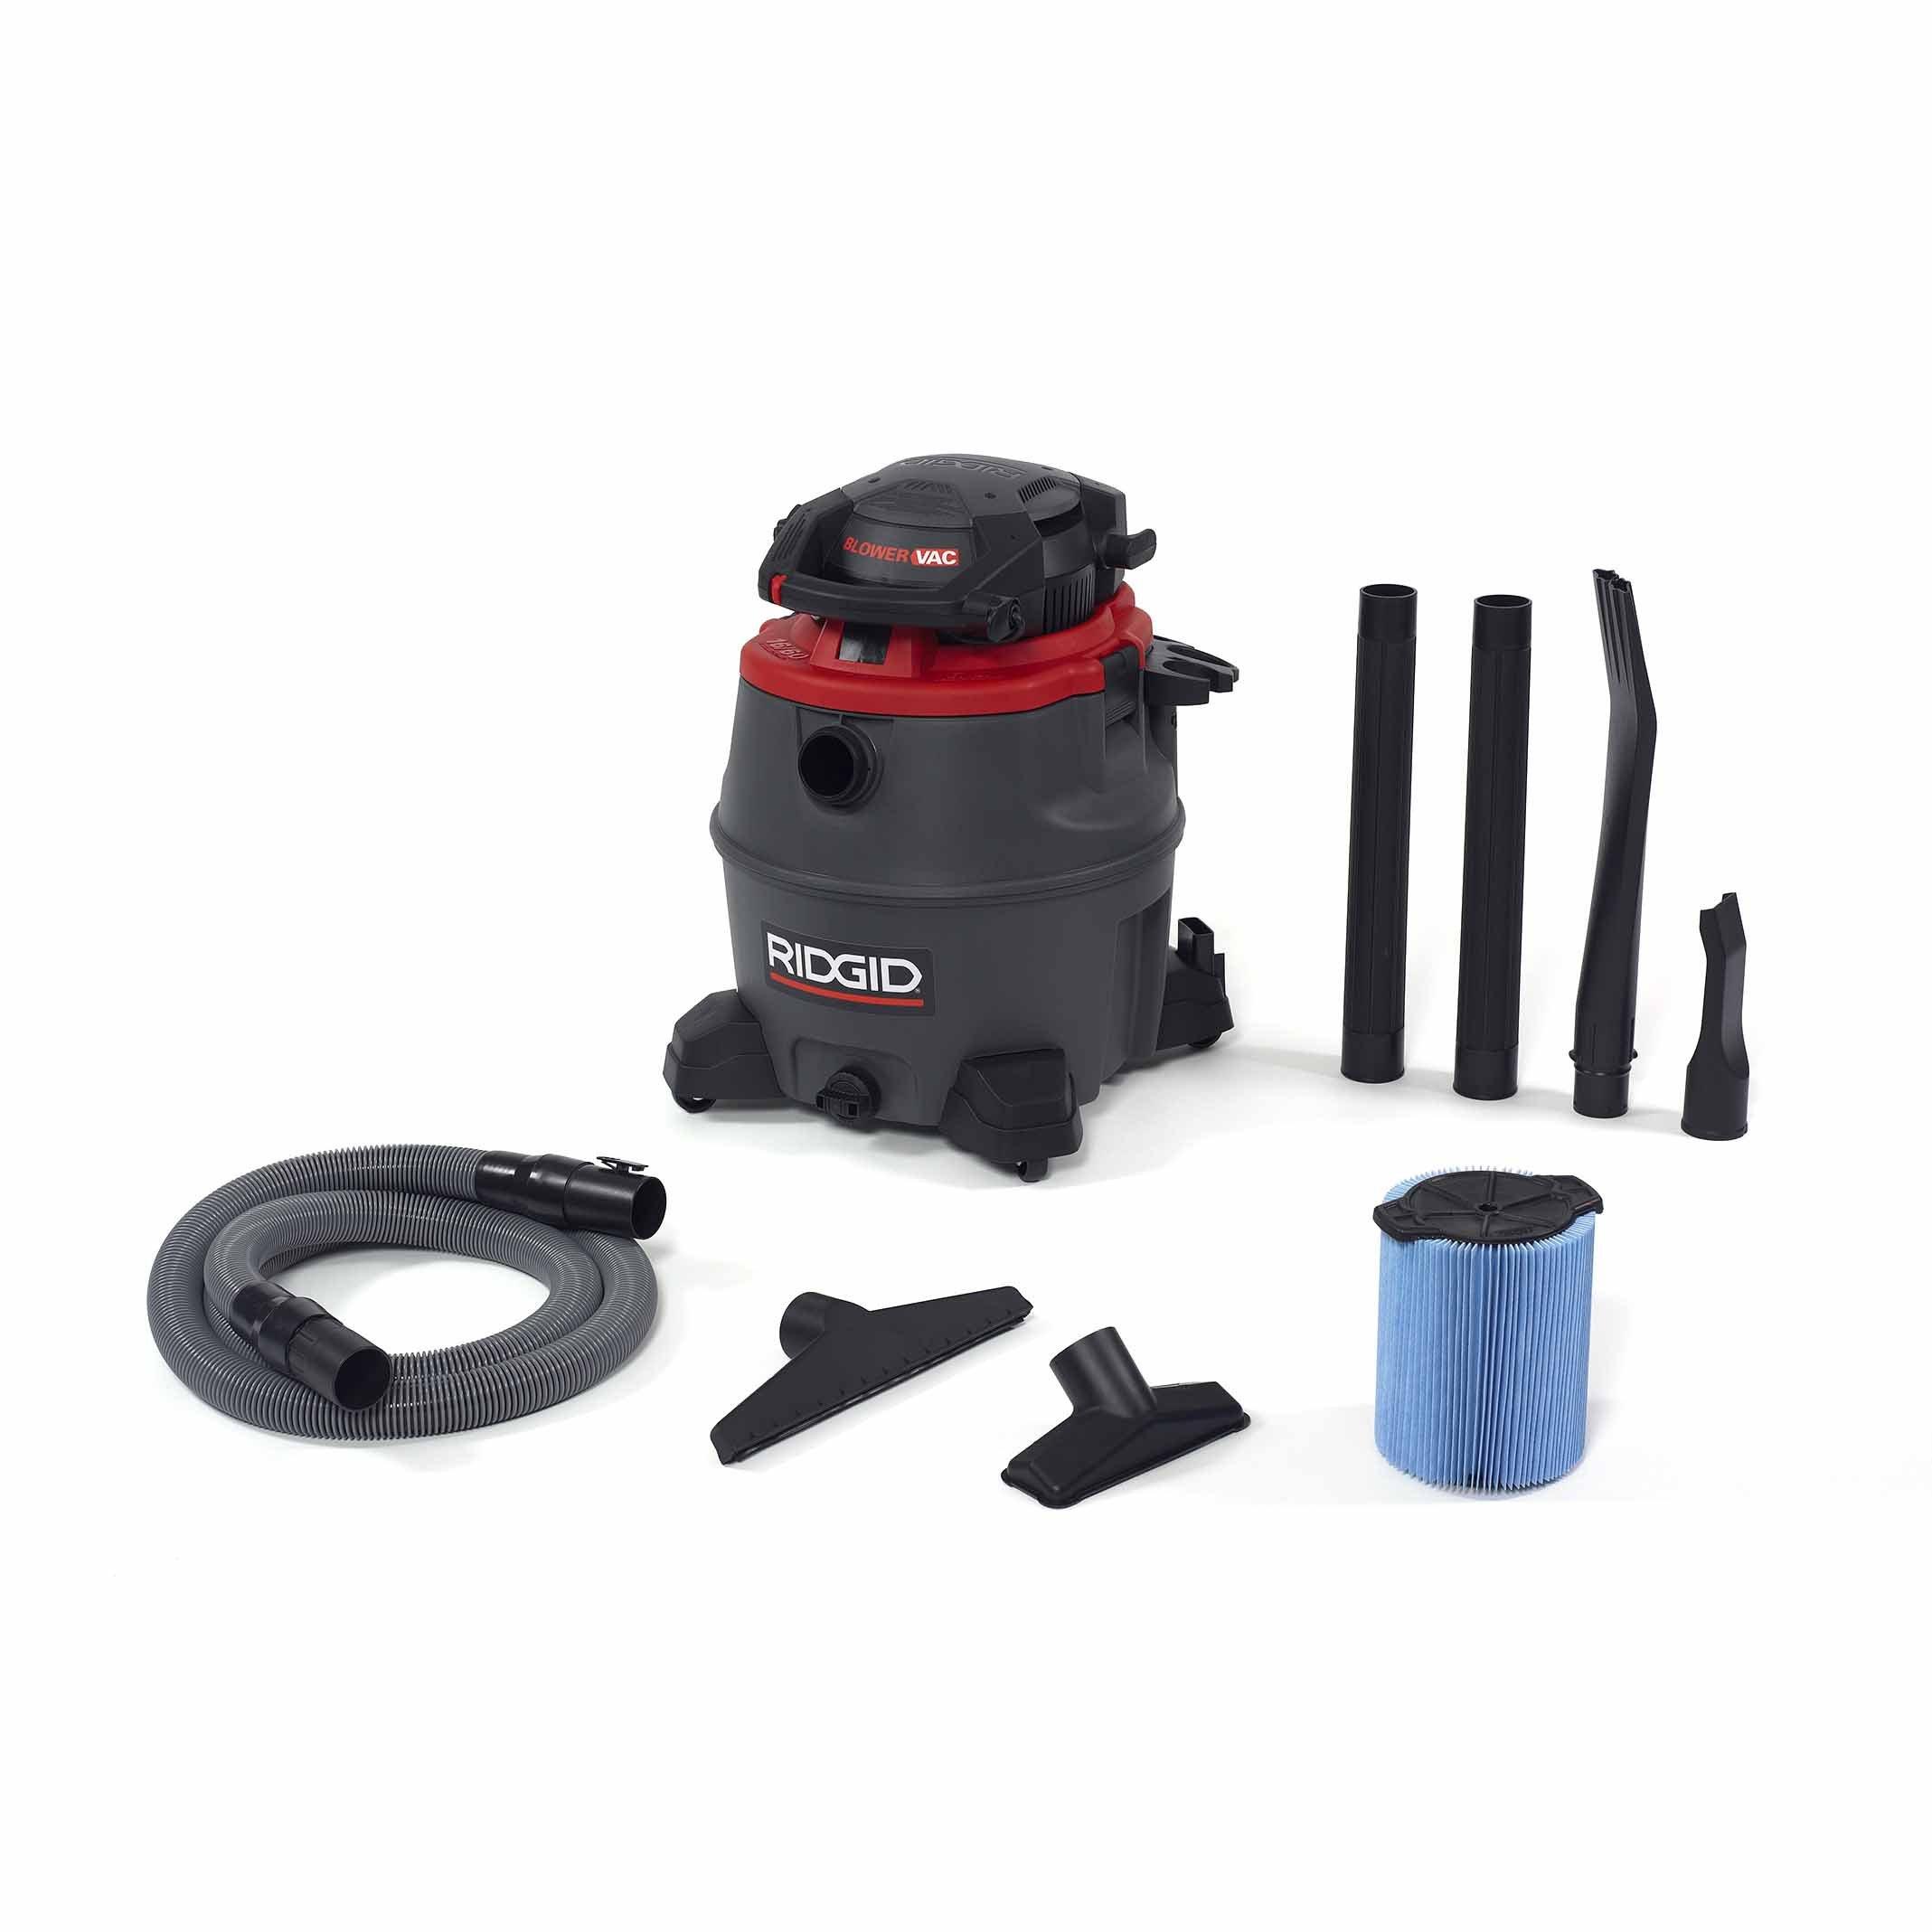 Ridgid 50343 1620RV Wet/Dry Vacuum with Blower, 16 gal, Red by Ridgid